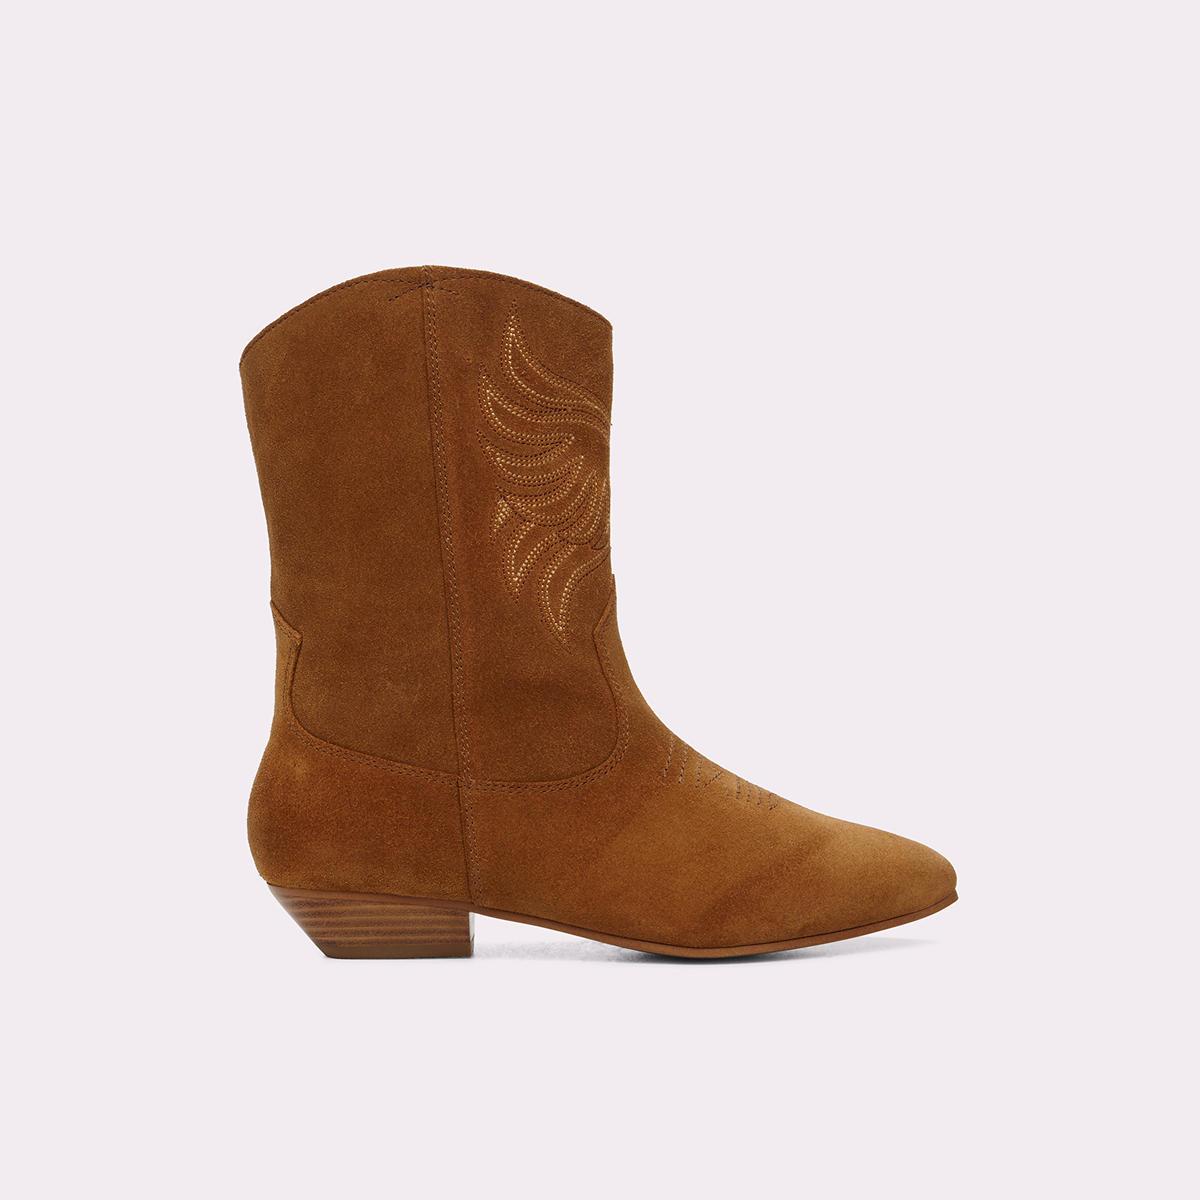 Asalidia Light Brown Women's Boots   US